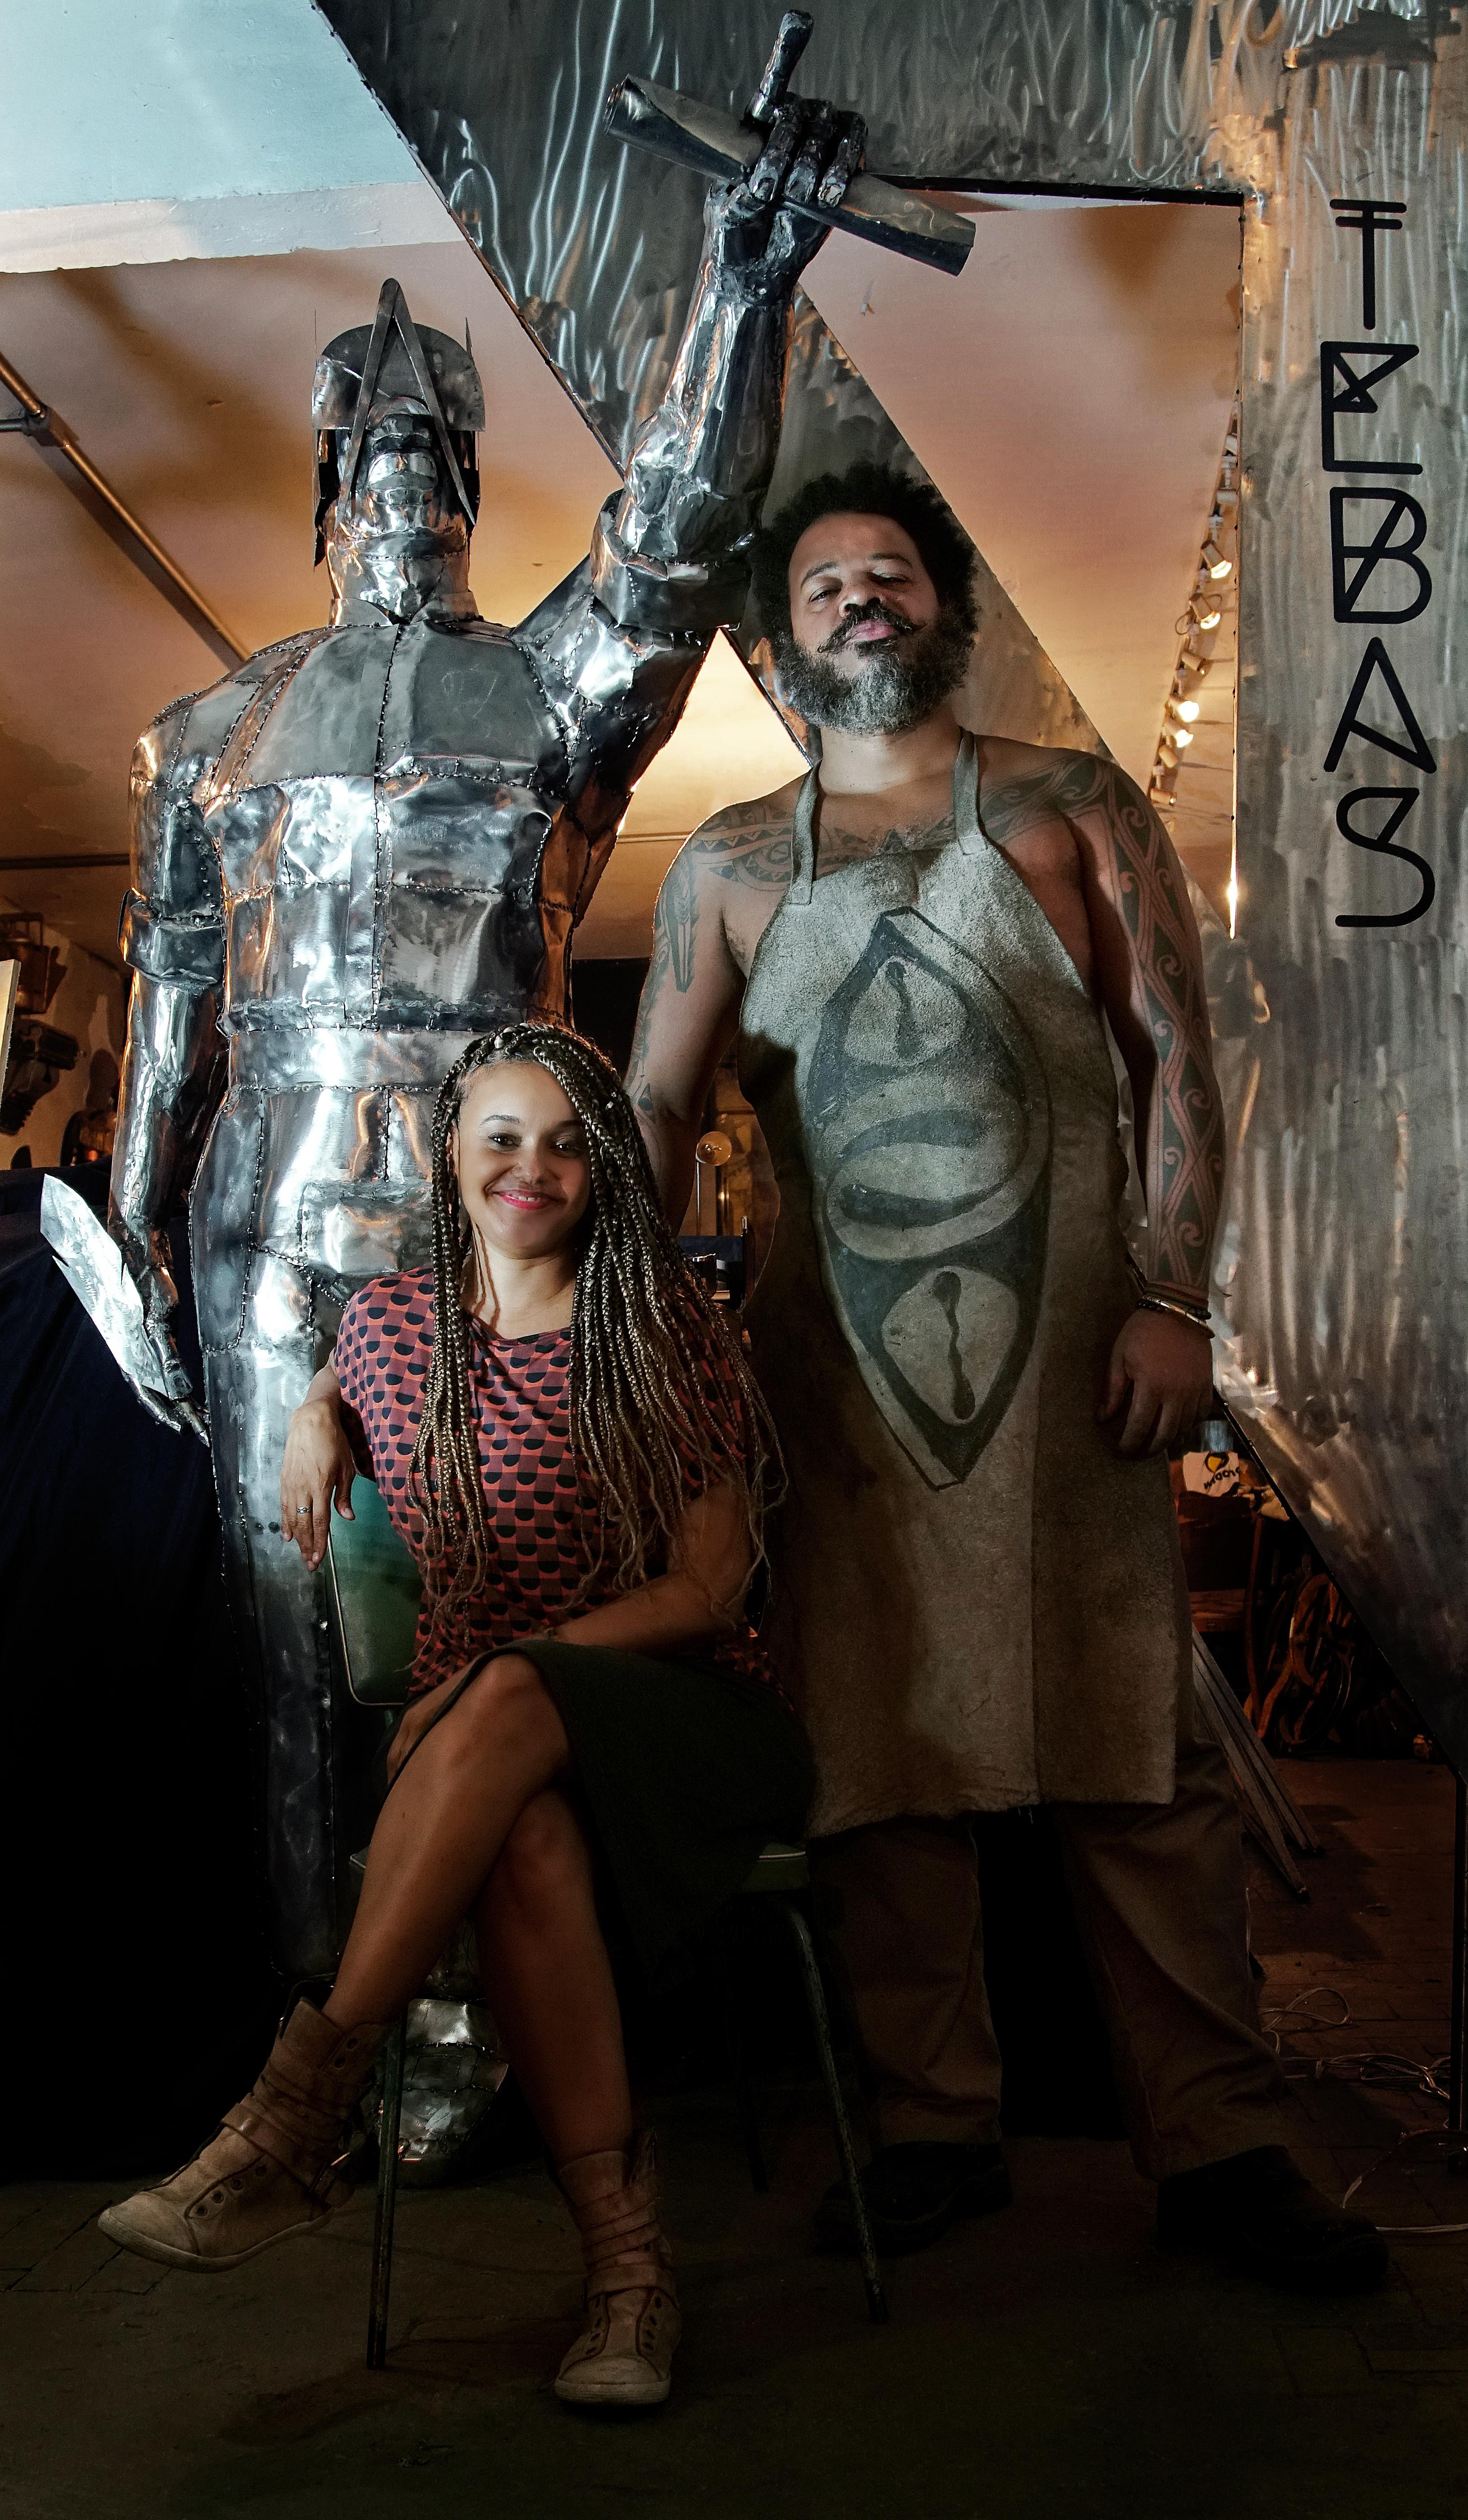 Francine e Lumumba, autores da escultura de Tebas.